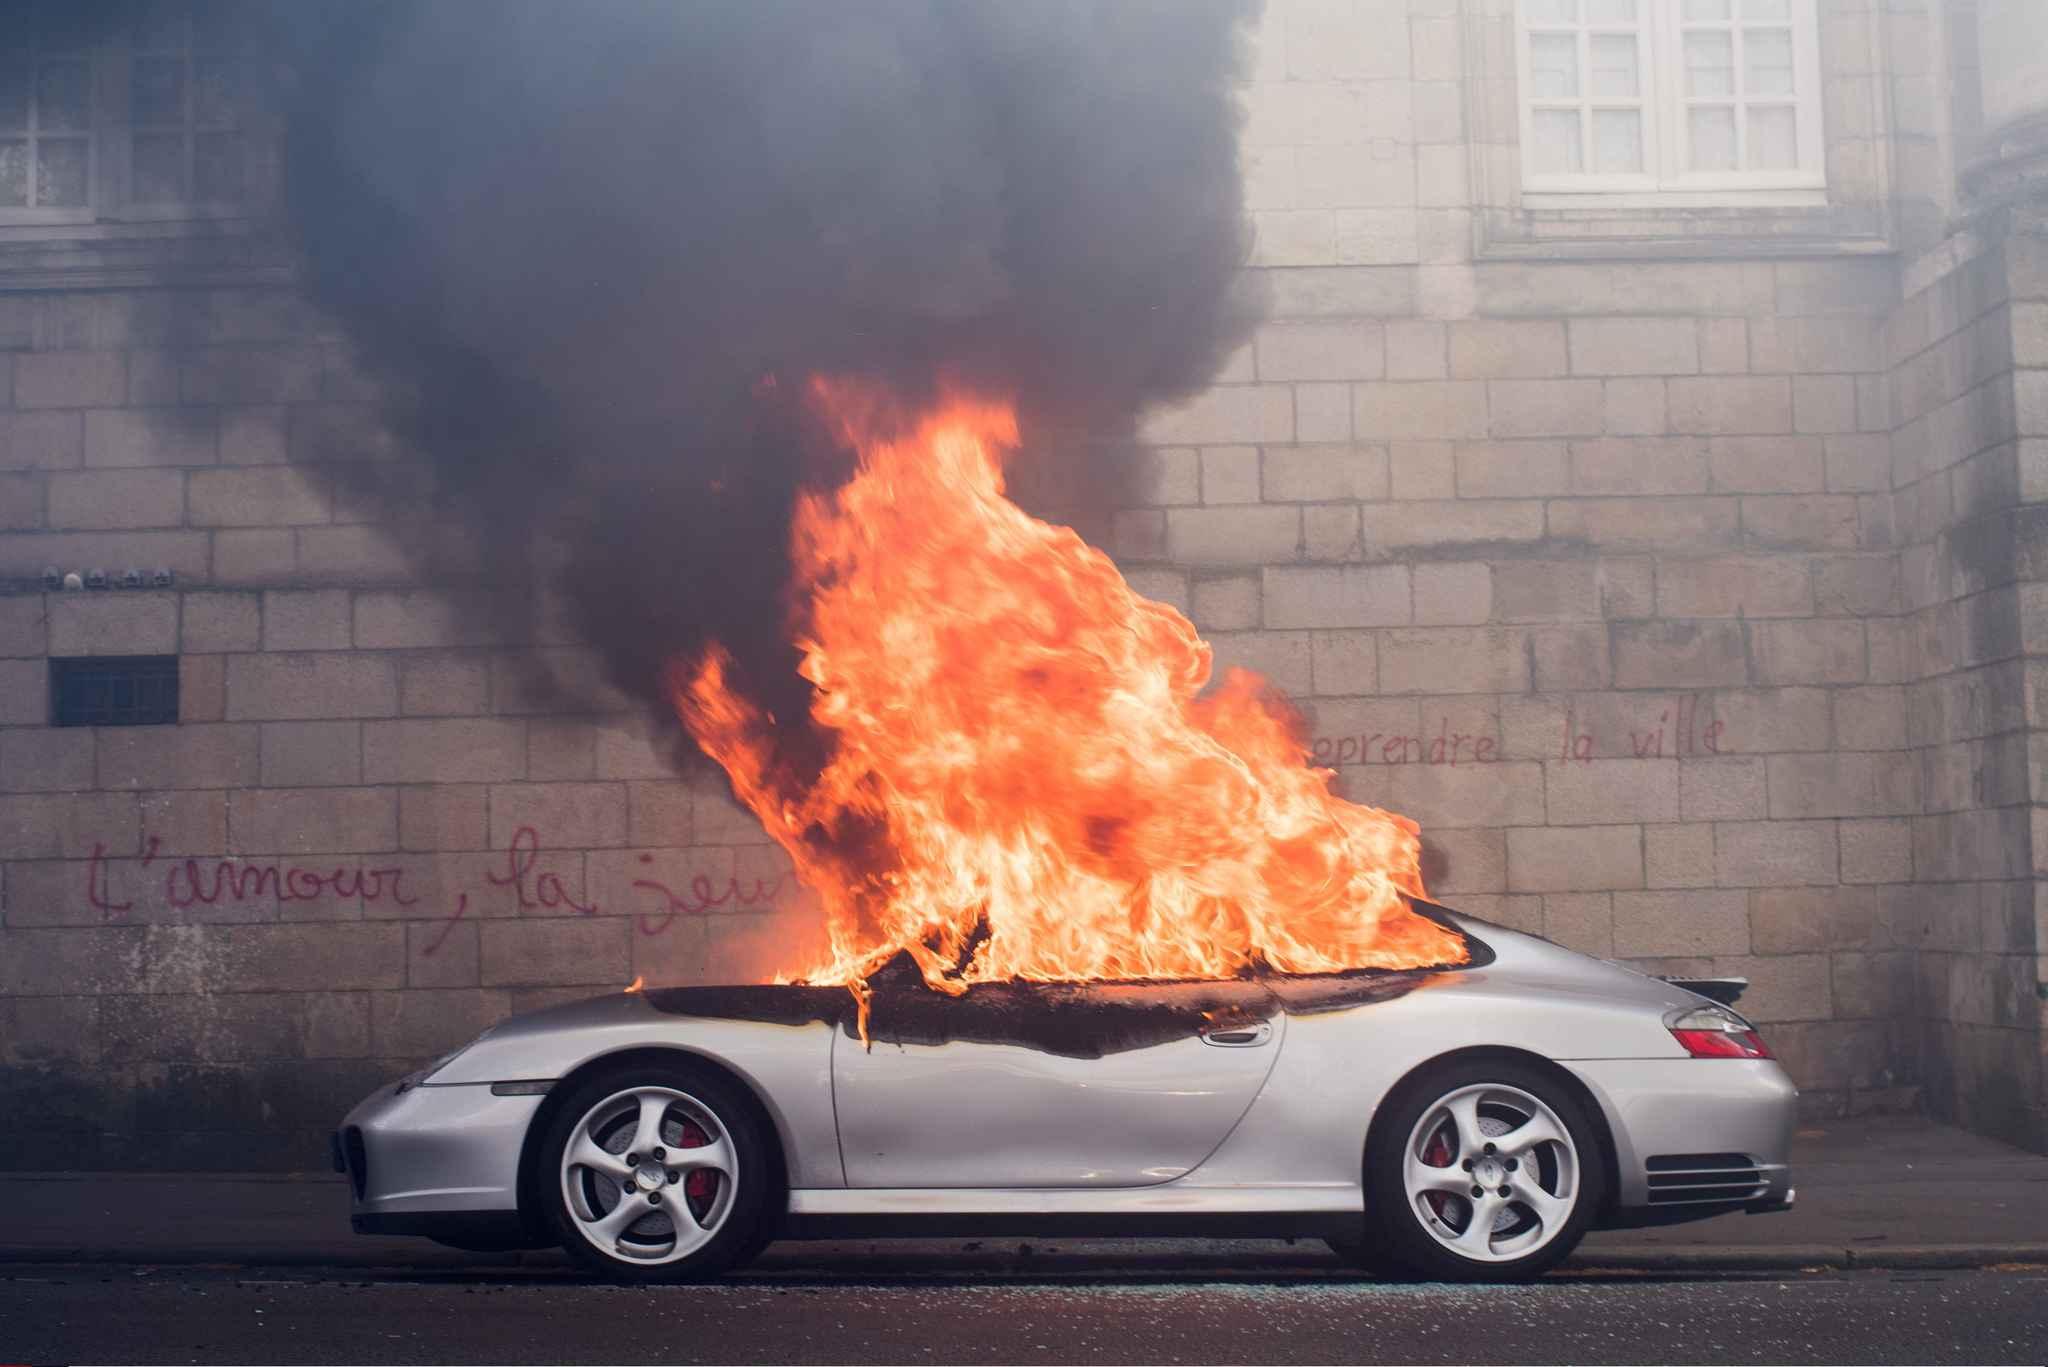 porsche incendi e nantes le propri taire est un passionn de voitures ni riche ni patron. Black Bedroom Furniture Sets. Home Design Ideas